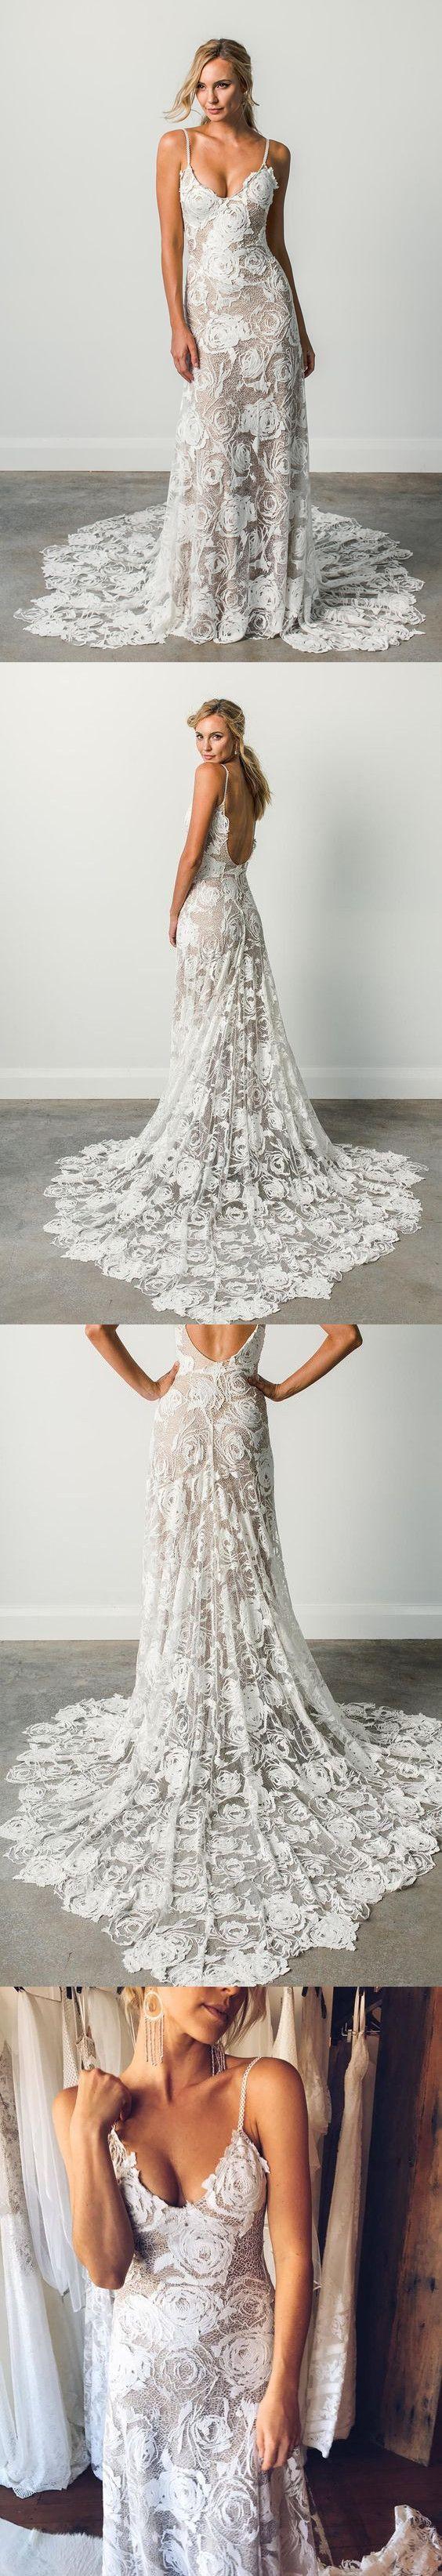 Charming spagetti strap vneck sweep train tight lace beach wedding